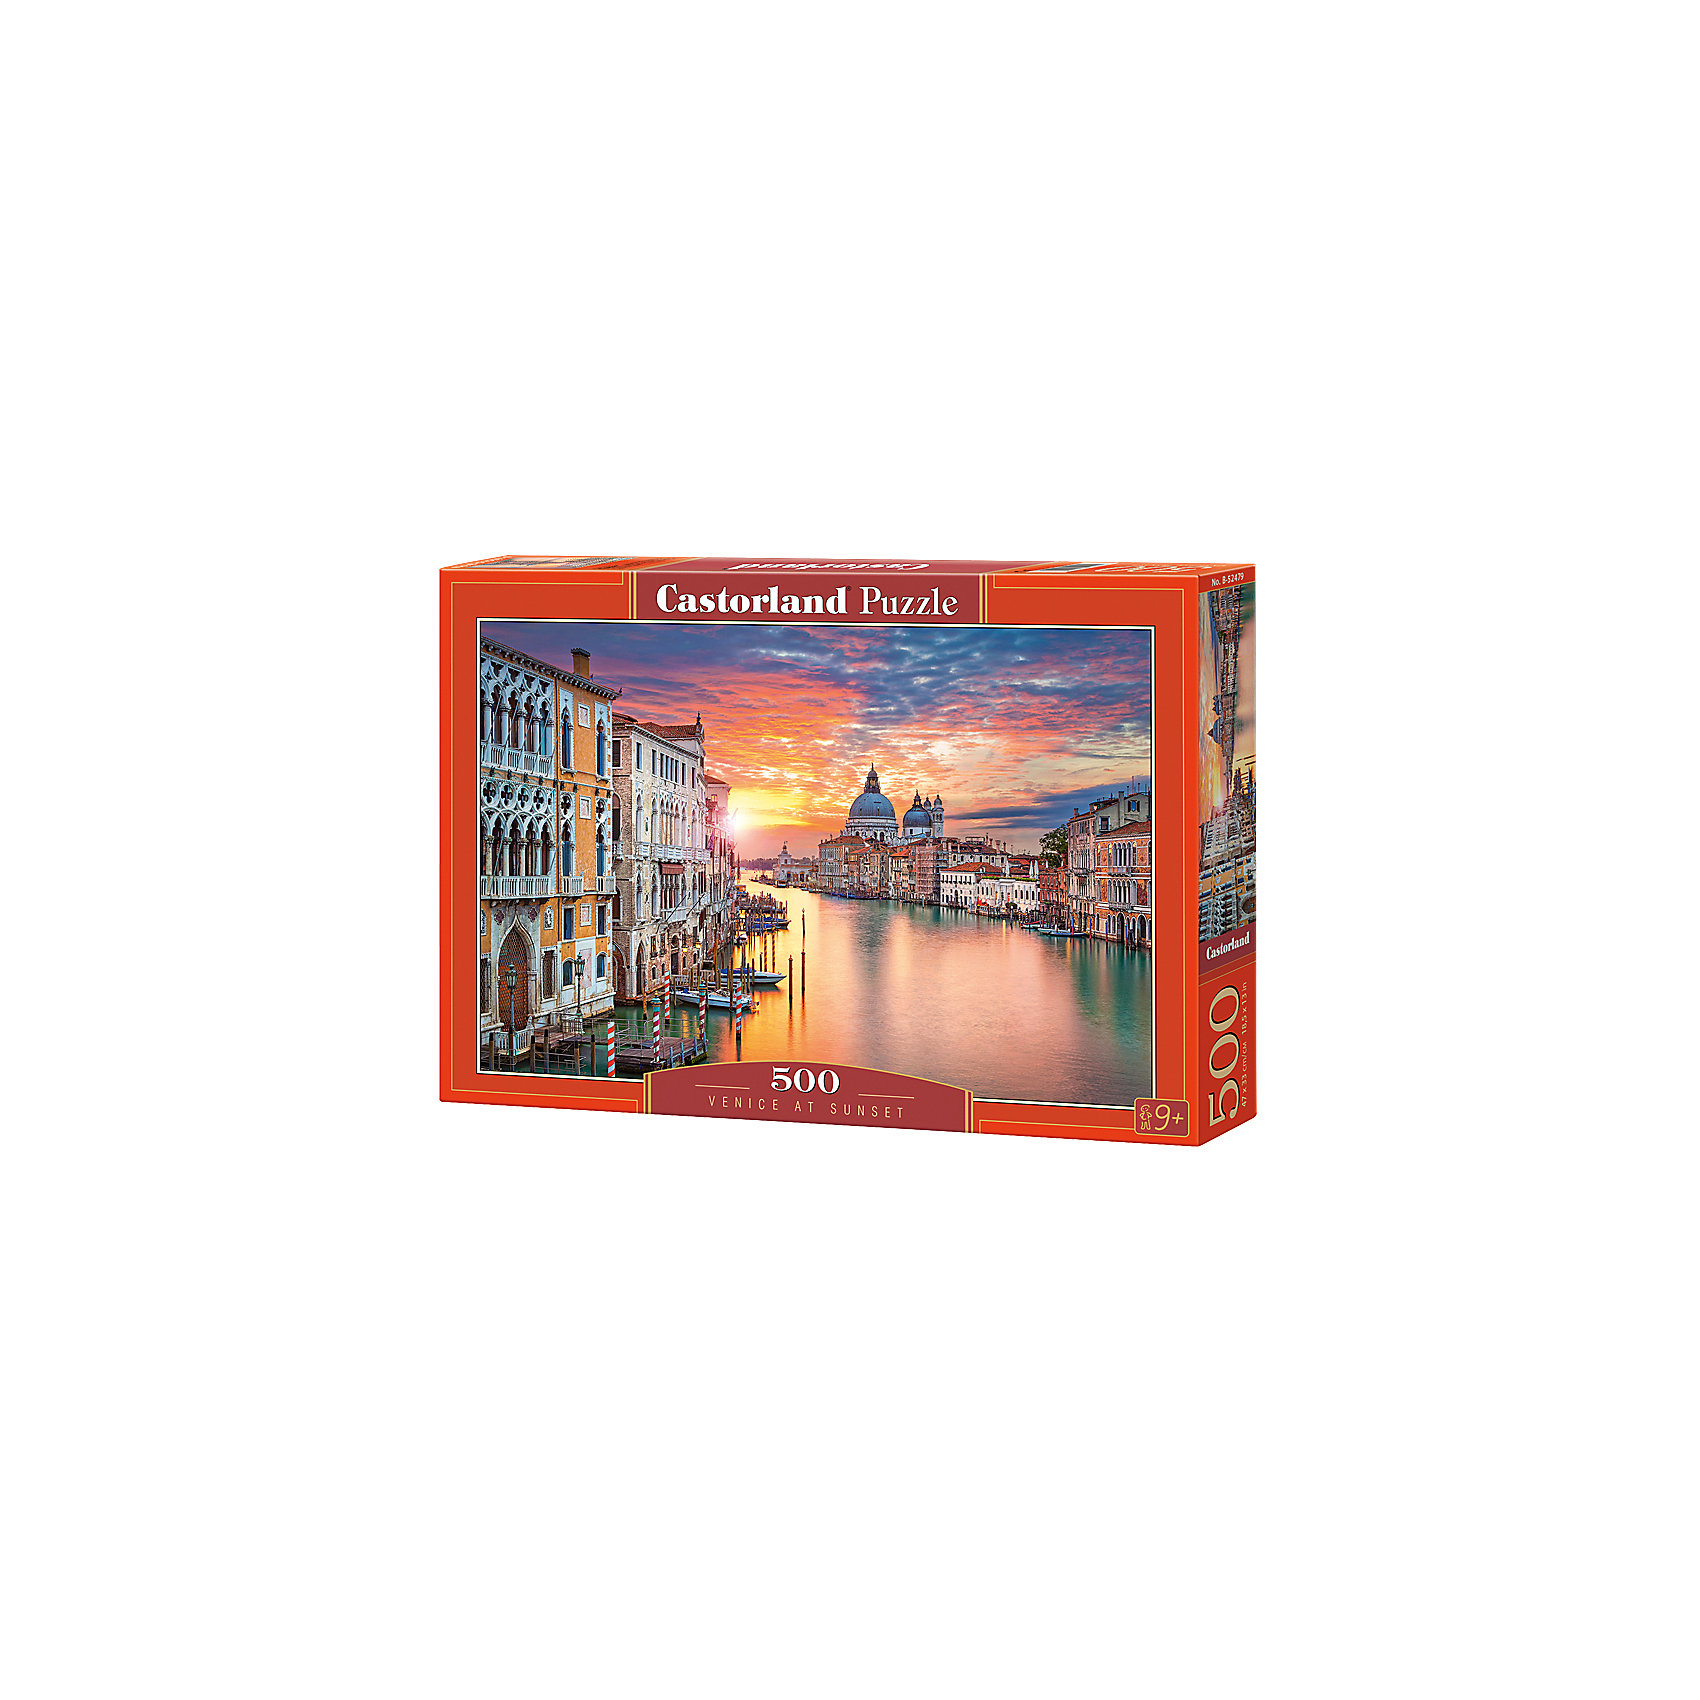 Пазлы Венеция на закате  , 500 деталей, CastorlandПазлы для детей постарше<br>Изображение:Венеция на закате. Кол-во деталей 500.<br><br>Ширина мм: 320<br>Глубина мм: 47<br>Высота мм: 220<br>Вес г: 500<br>Возраст от месяцев: 72<br>Возраст до месяцев: 2147483647<br>Пол: Унисекс<br>Возраст: Детский<br>SKU: 6881587